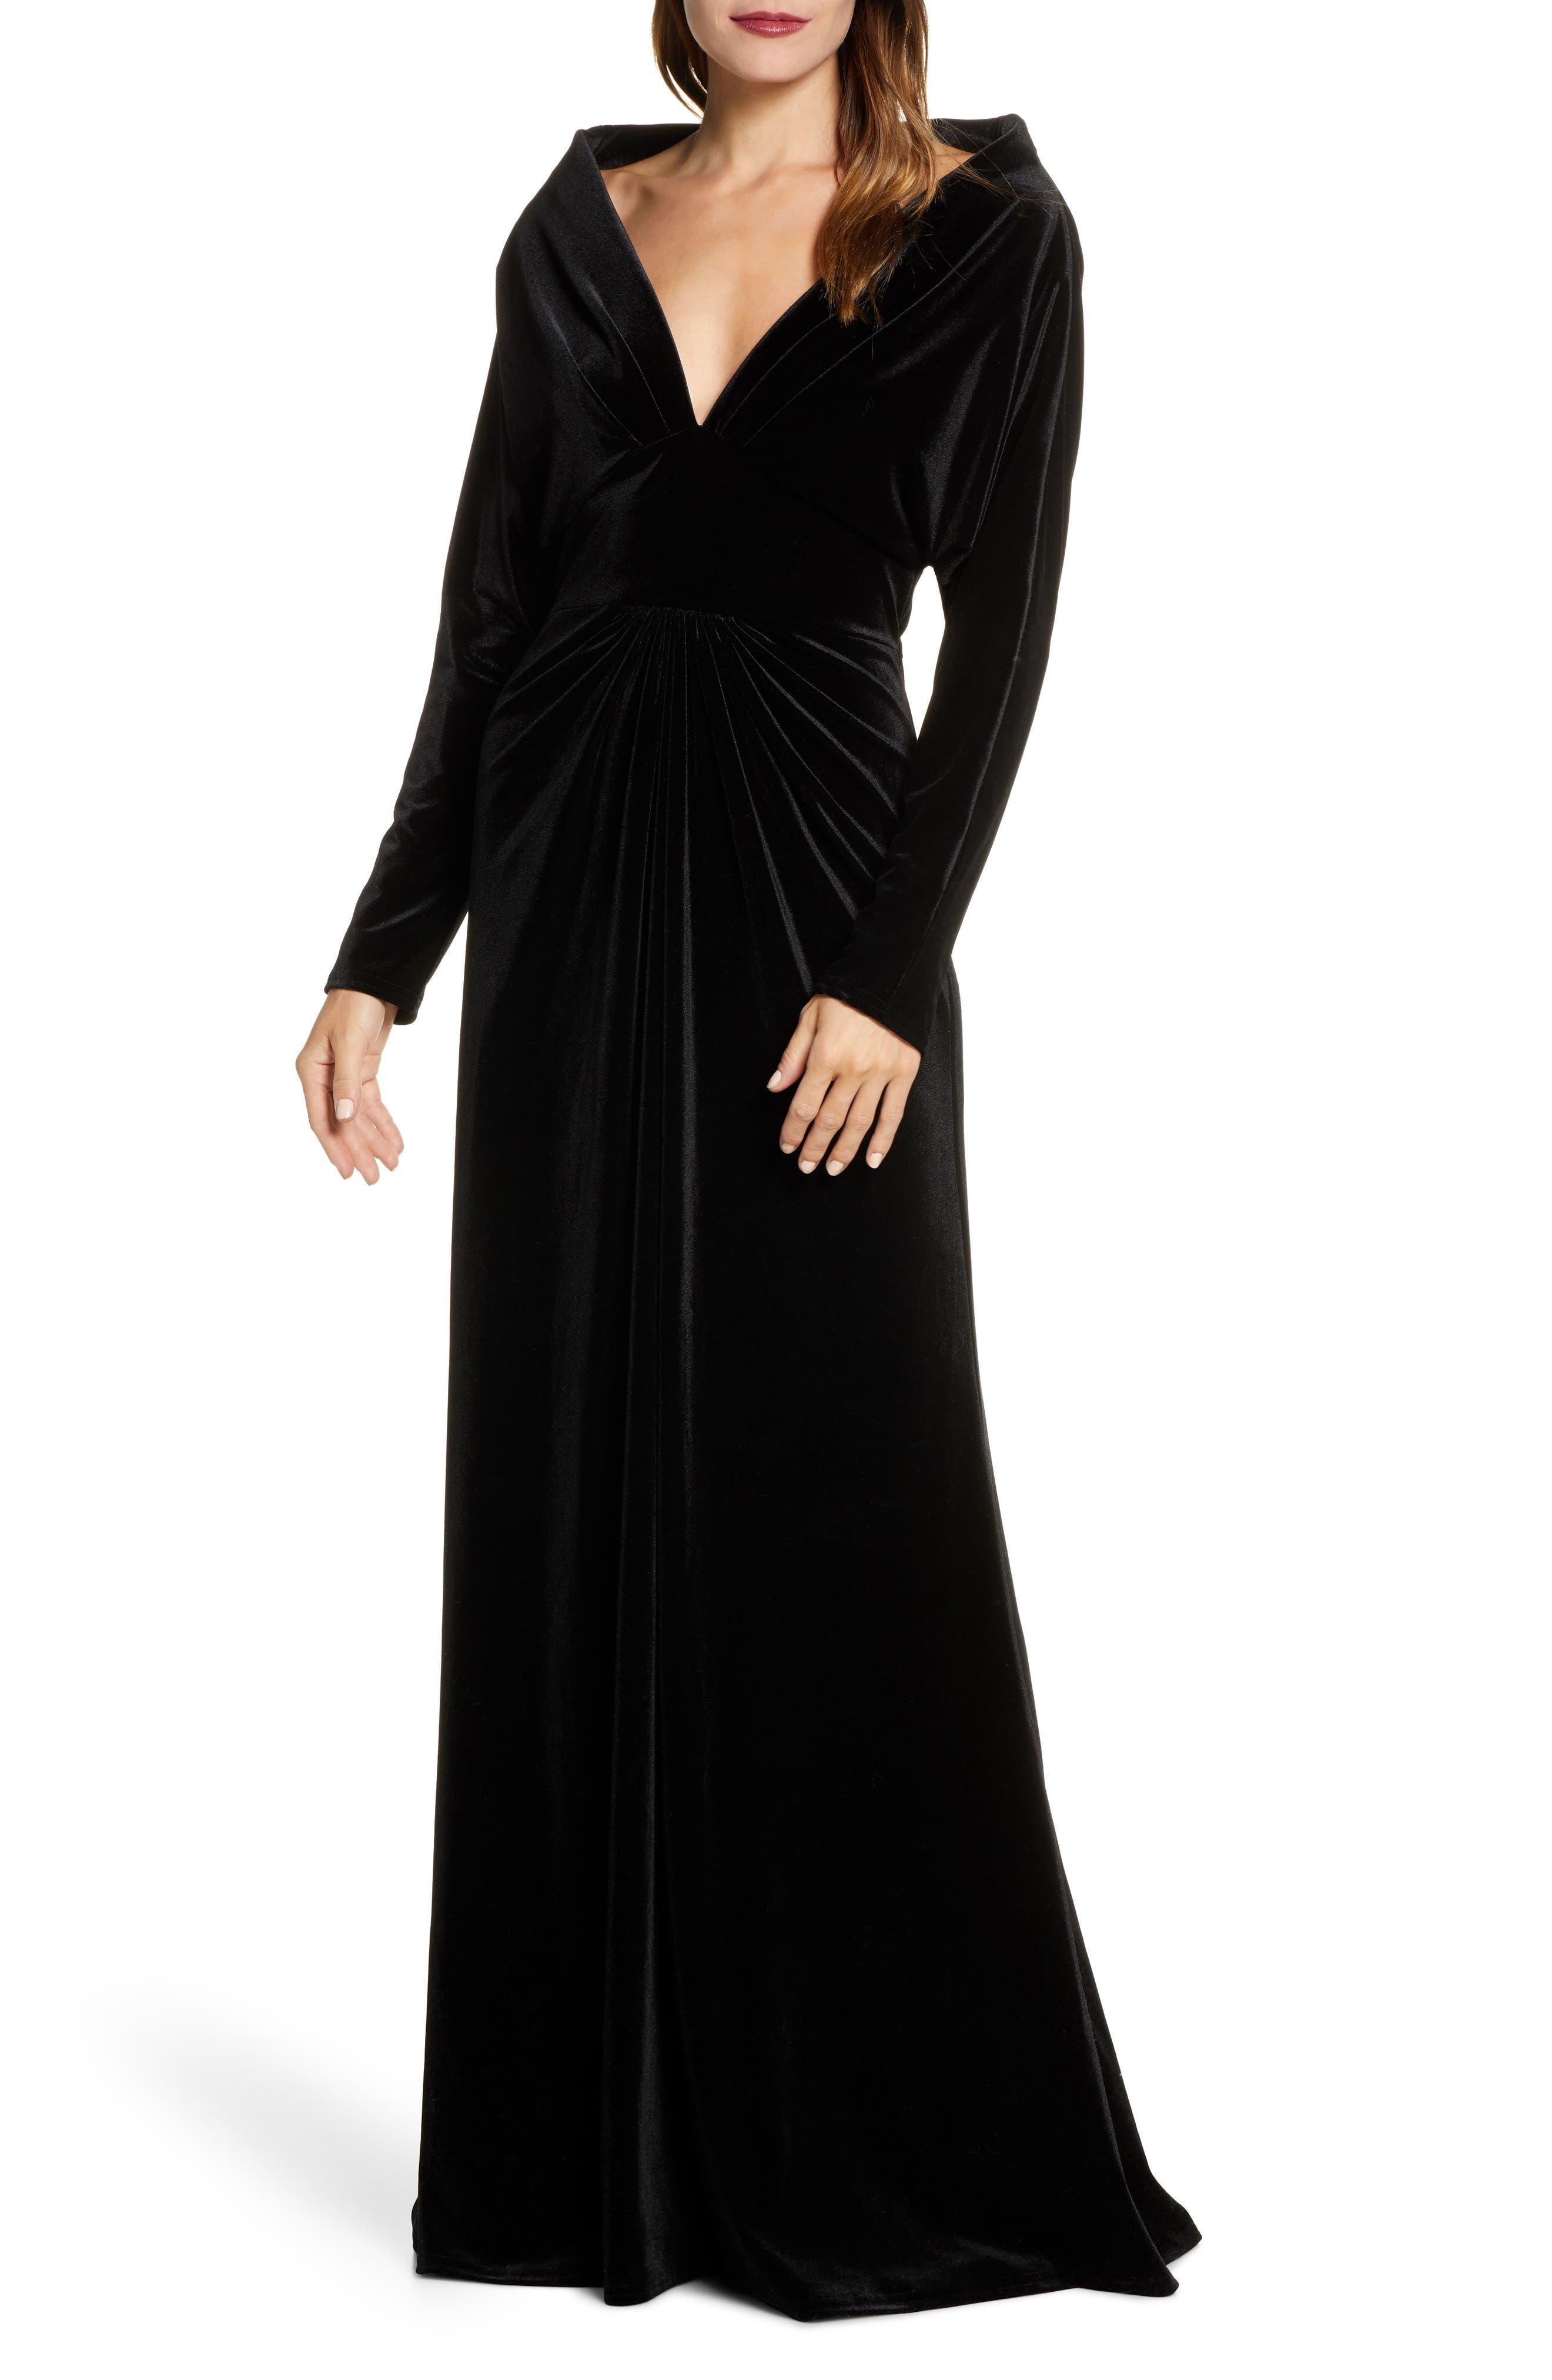 1930s Style Clothing and Fashion Womens Tadashi Shoji Plunge Neck Long Sleeve Velvet Evening Gown $398.00 AT vintagedancer.com